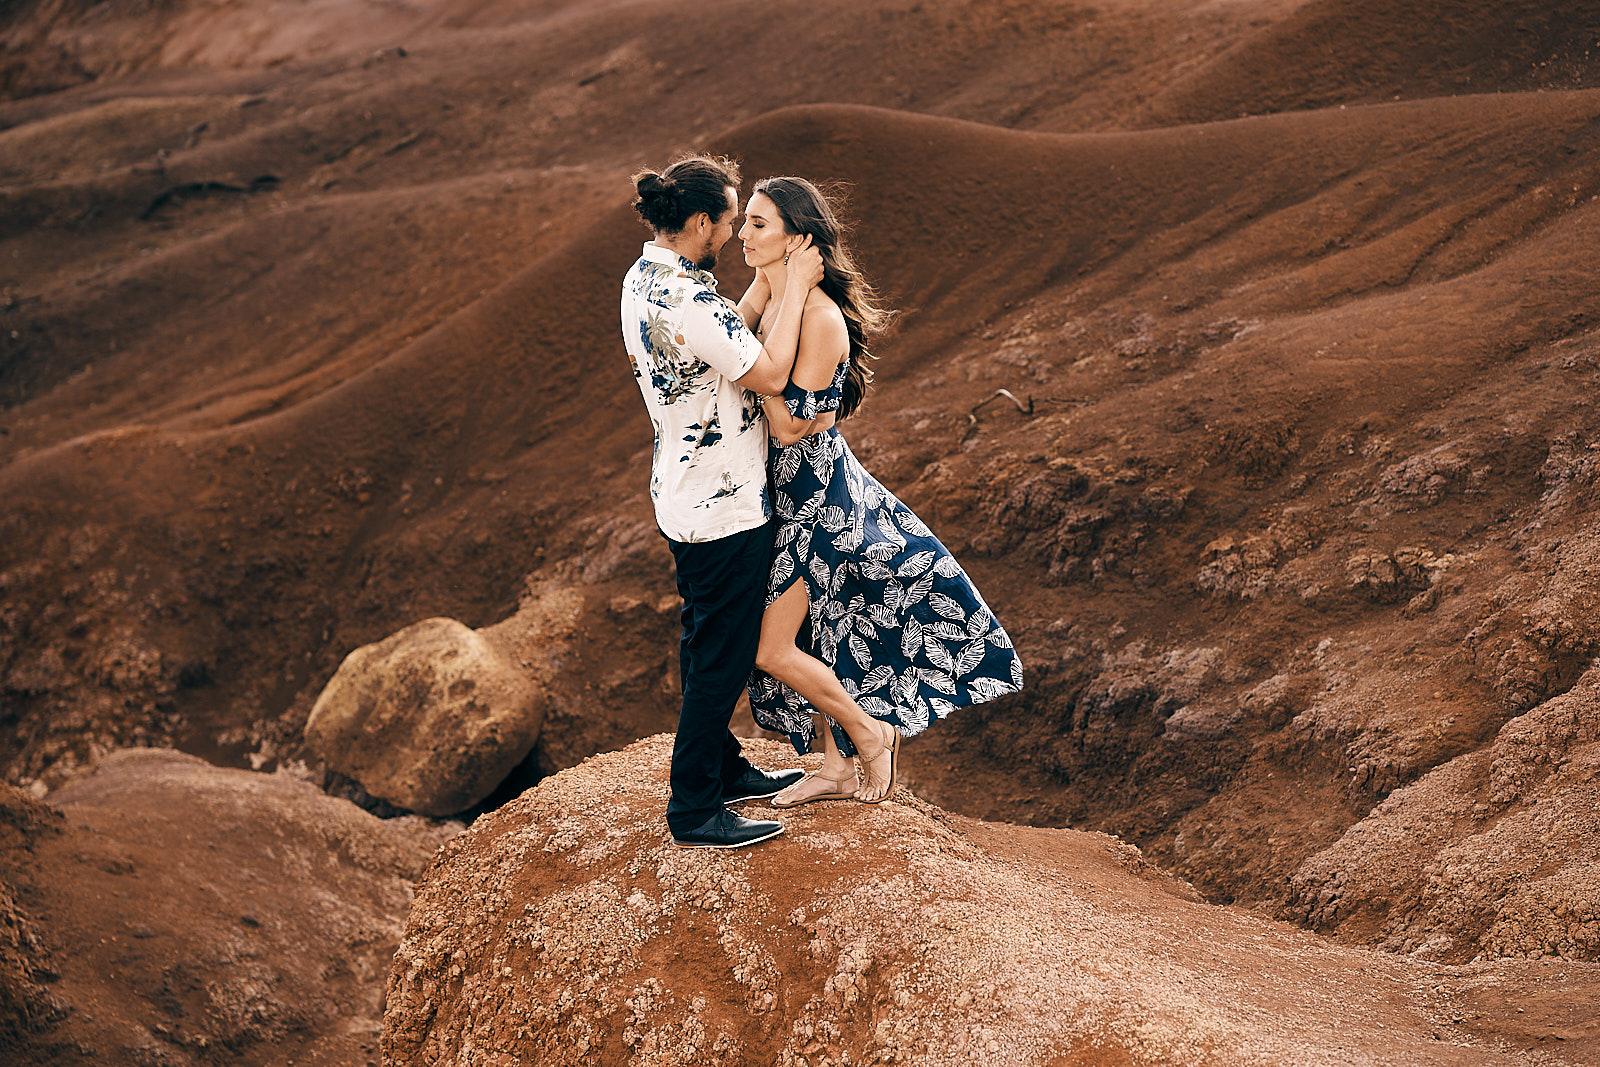 Kauai Engagement Photography By Afewgoodclicks